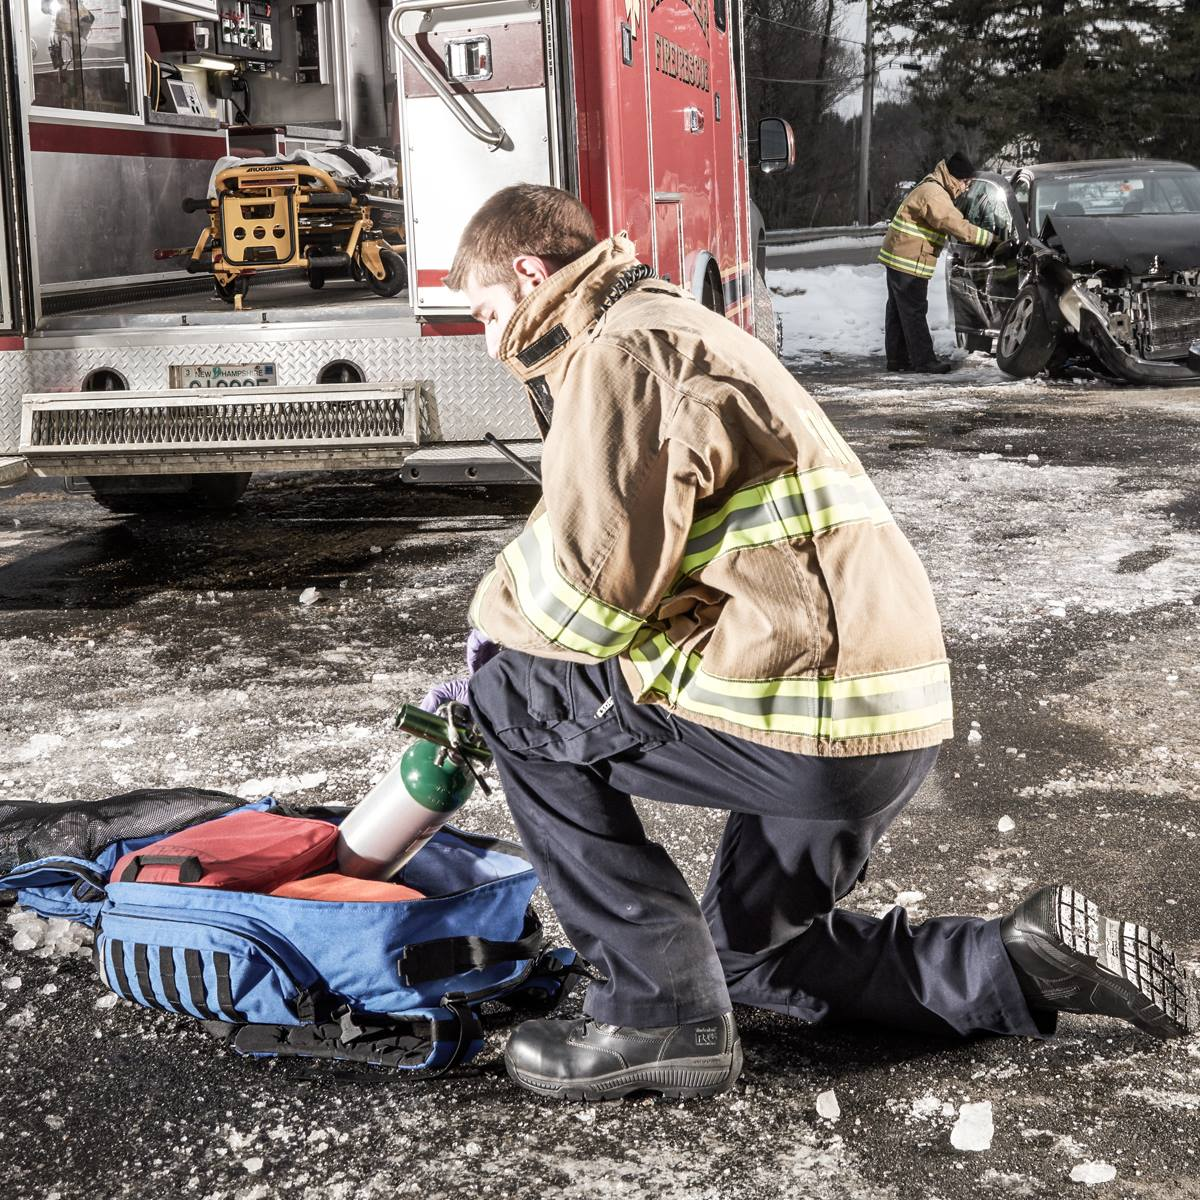 Firefighter Wearing Reflective Jacket